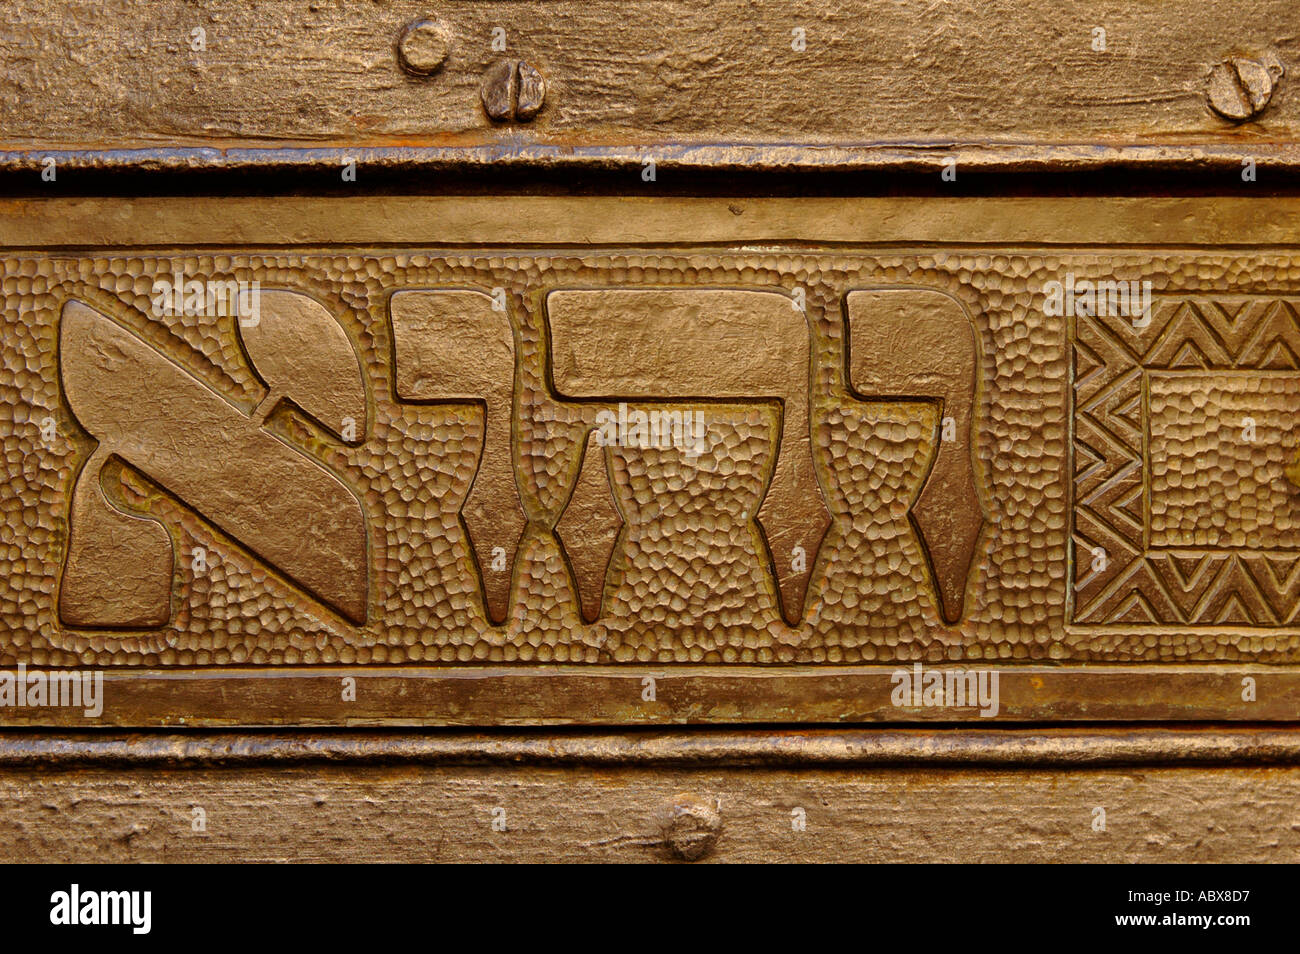 Czech Republic, Prague, Hebrew lettering, Josefov, Jewish Quarter - Stock Image